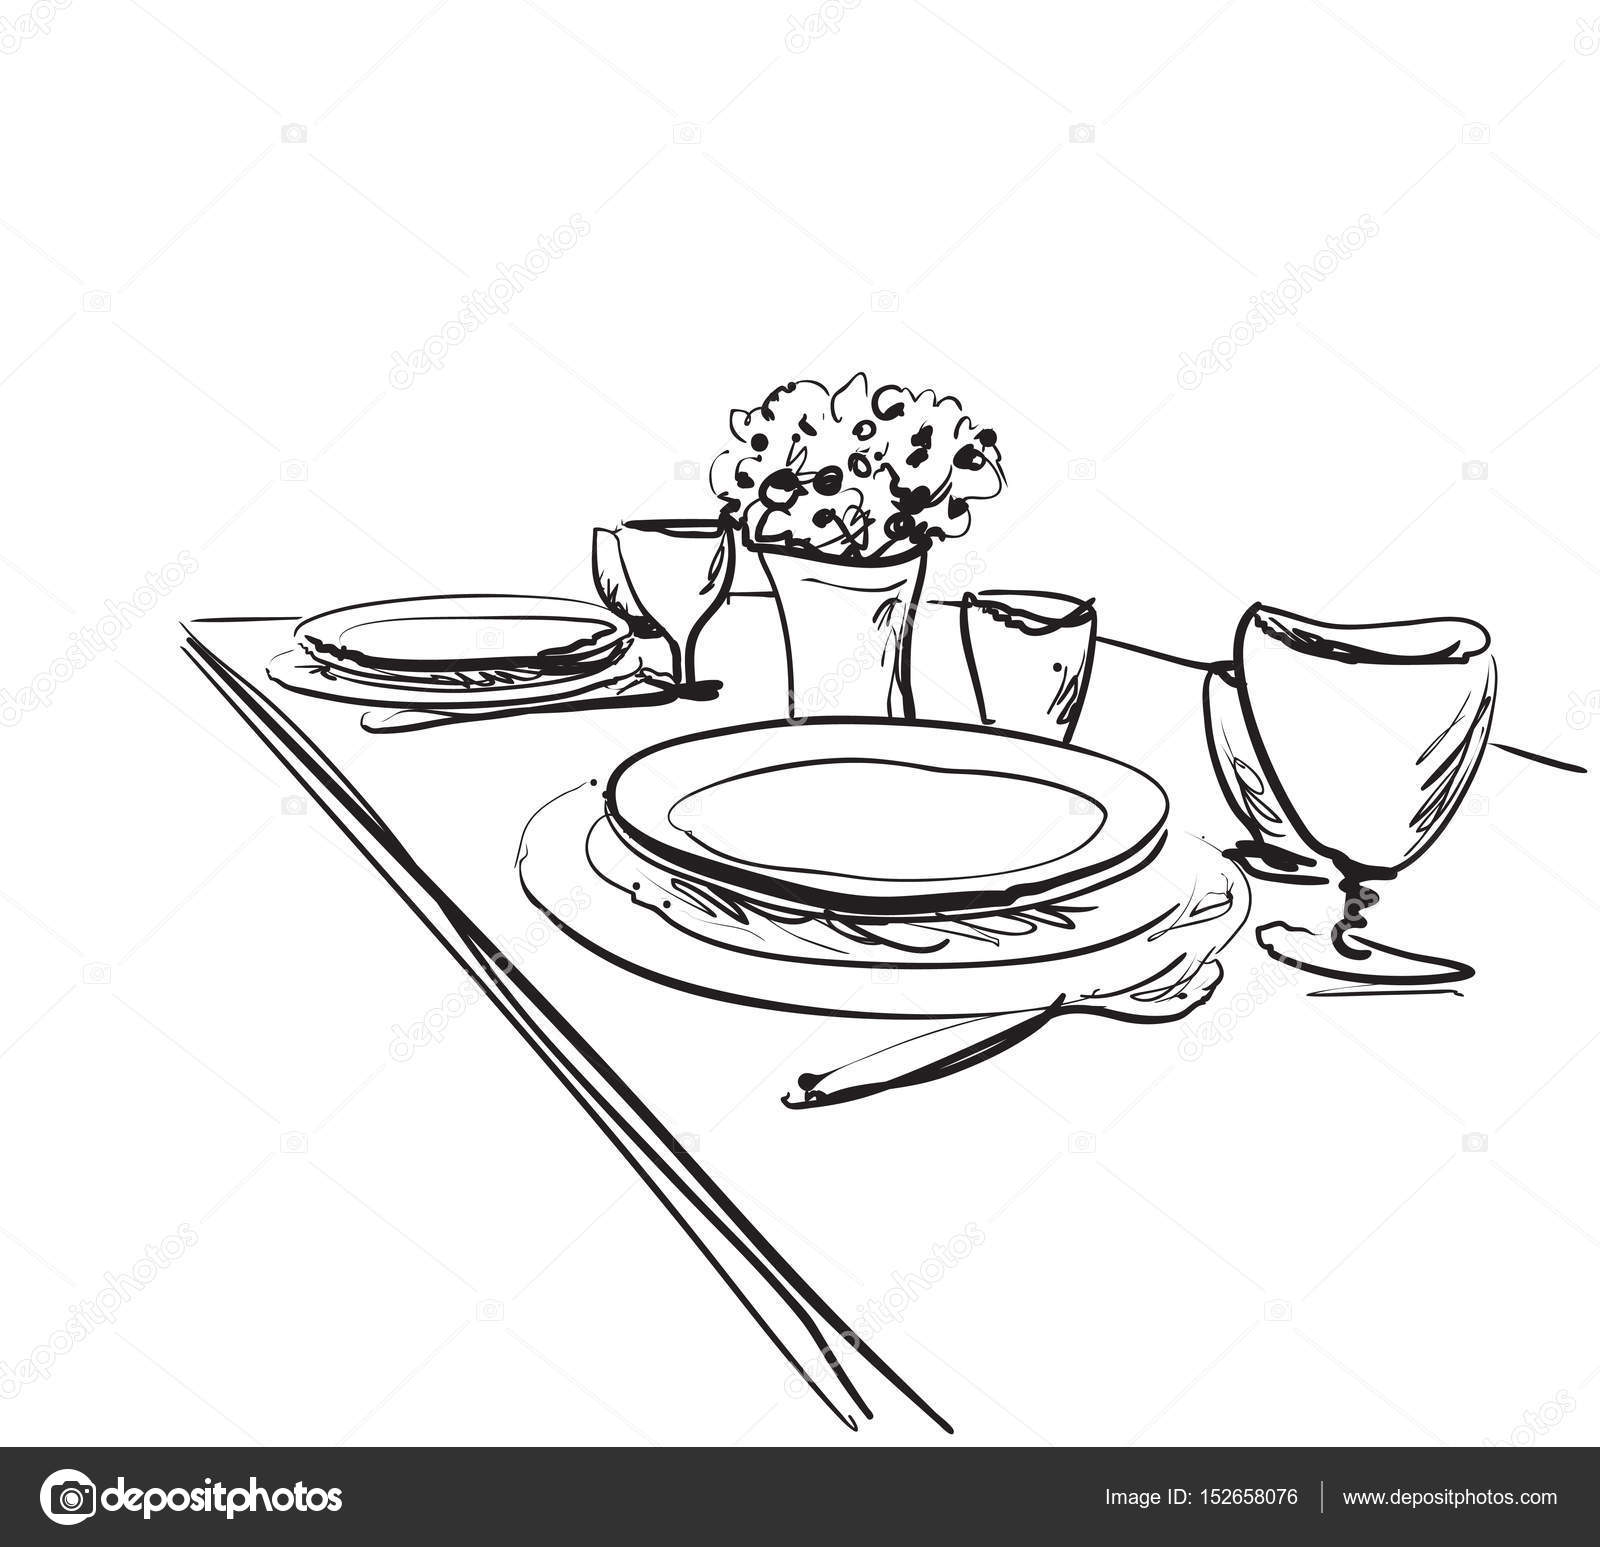 Table setting set. Weekend breakfast or dinner. u2014 Stock Vector  sc 1 st  Depositphotos & Table setting set. Weekend breakfast or dinner. u2014 Stock Vector ...